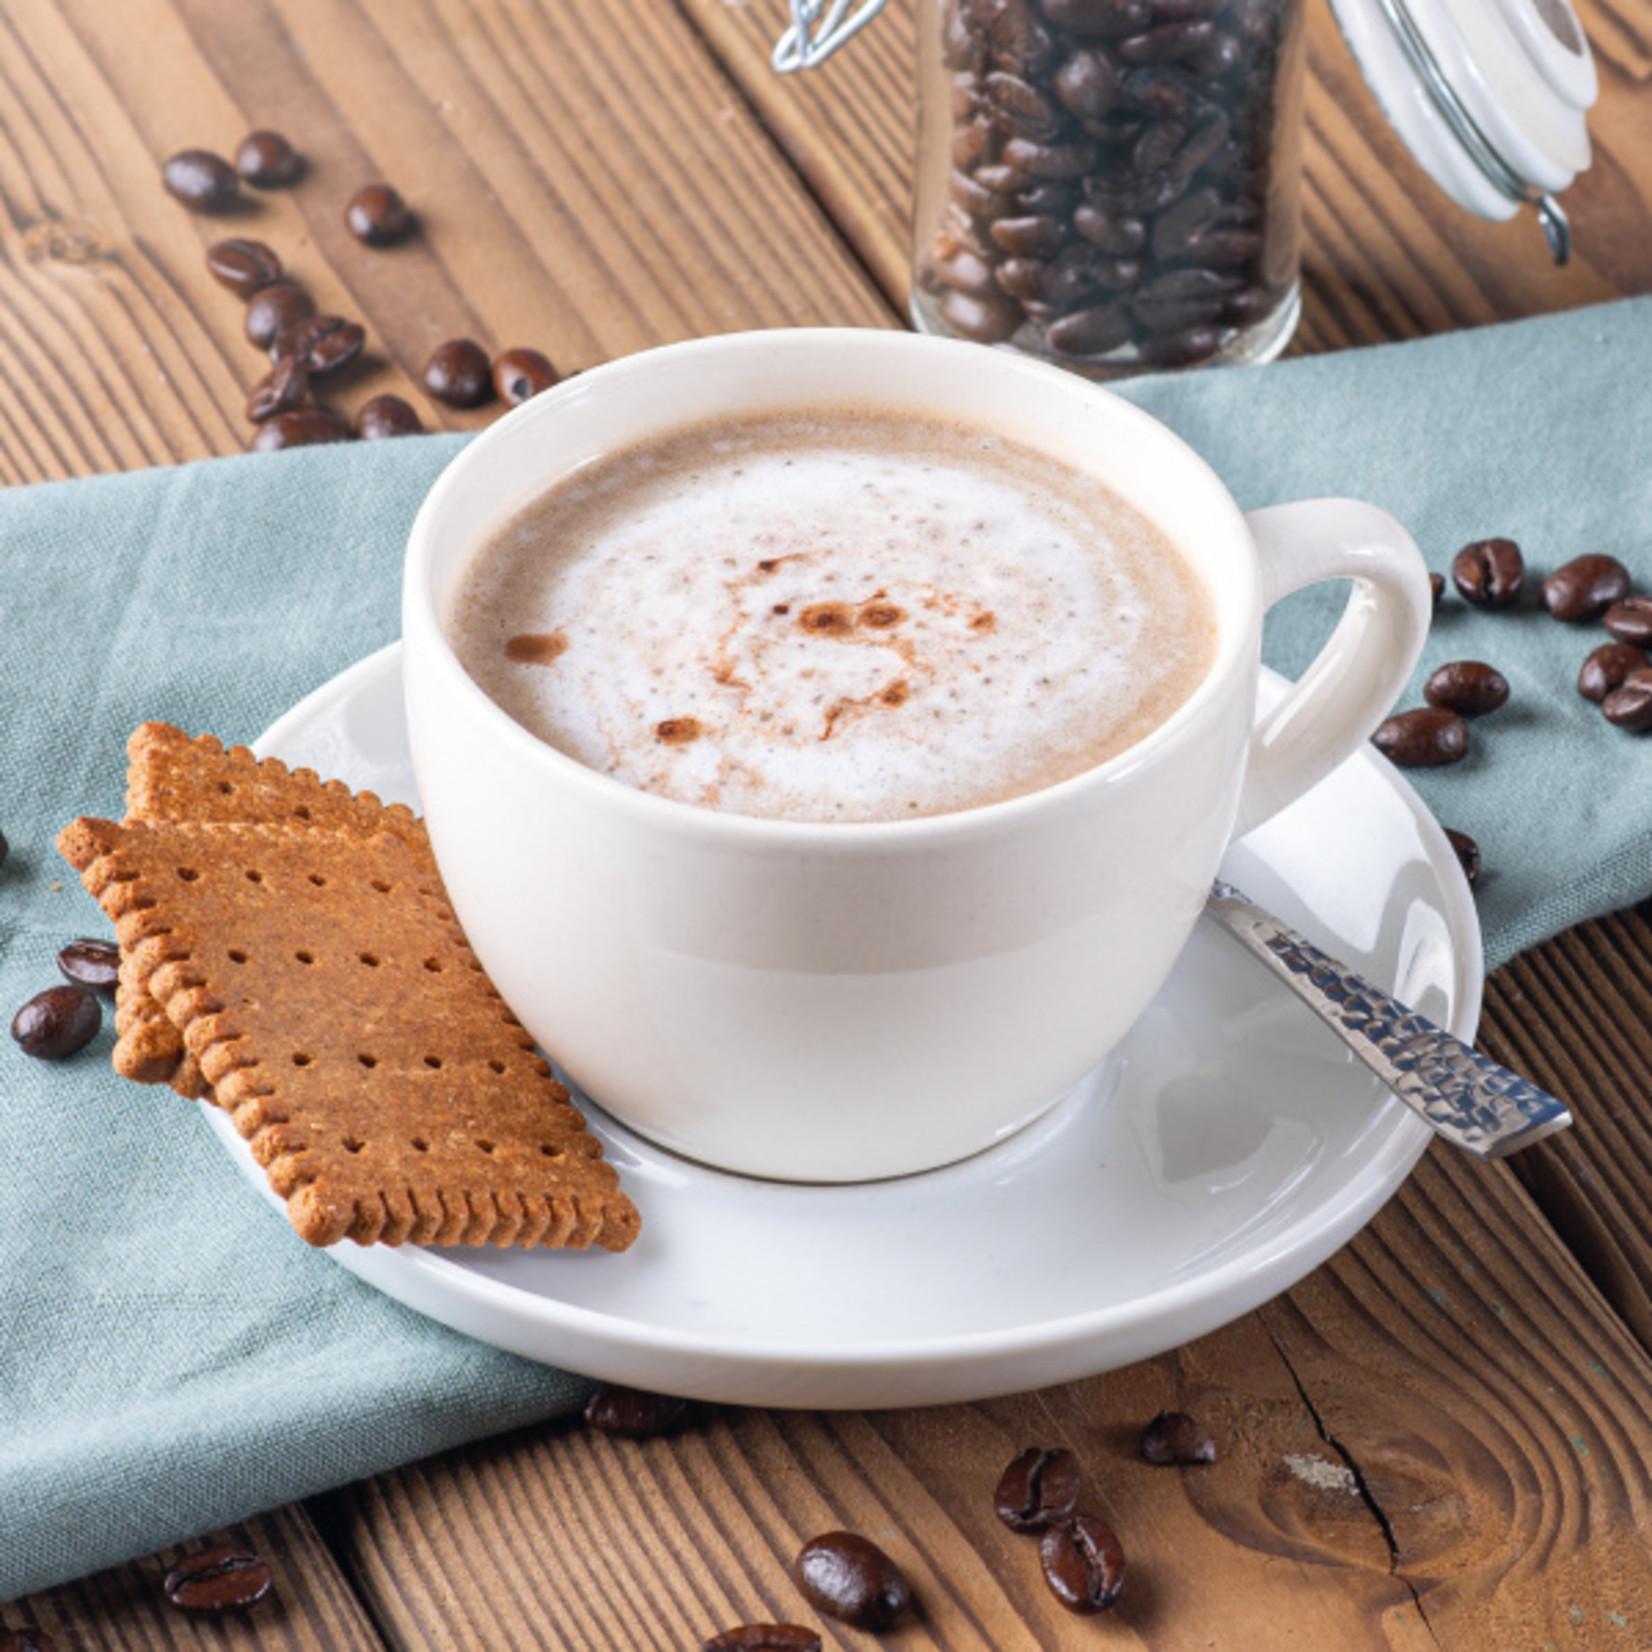 Powerslim PS03011 Drank romige cappuccino